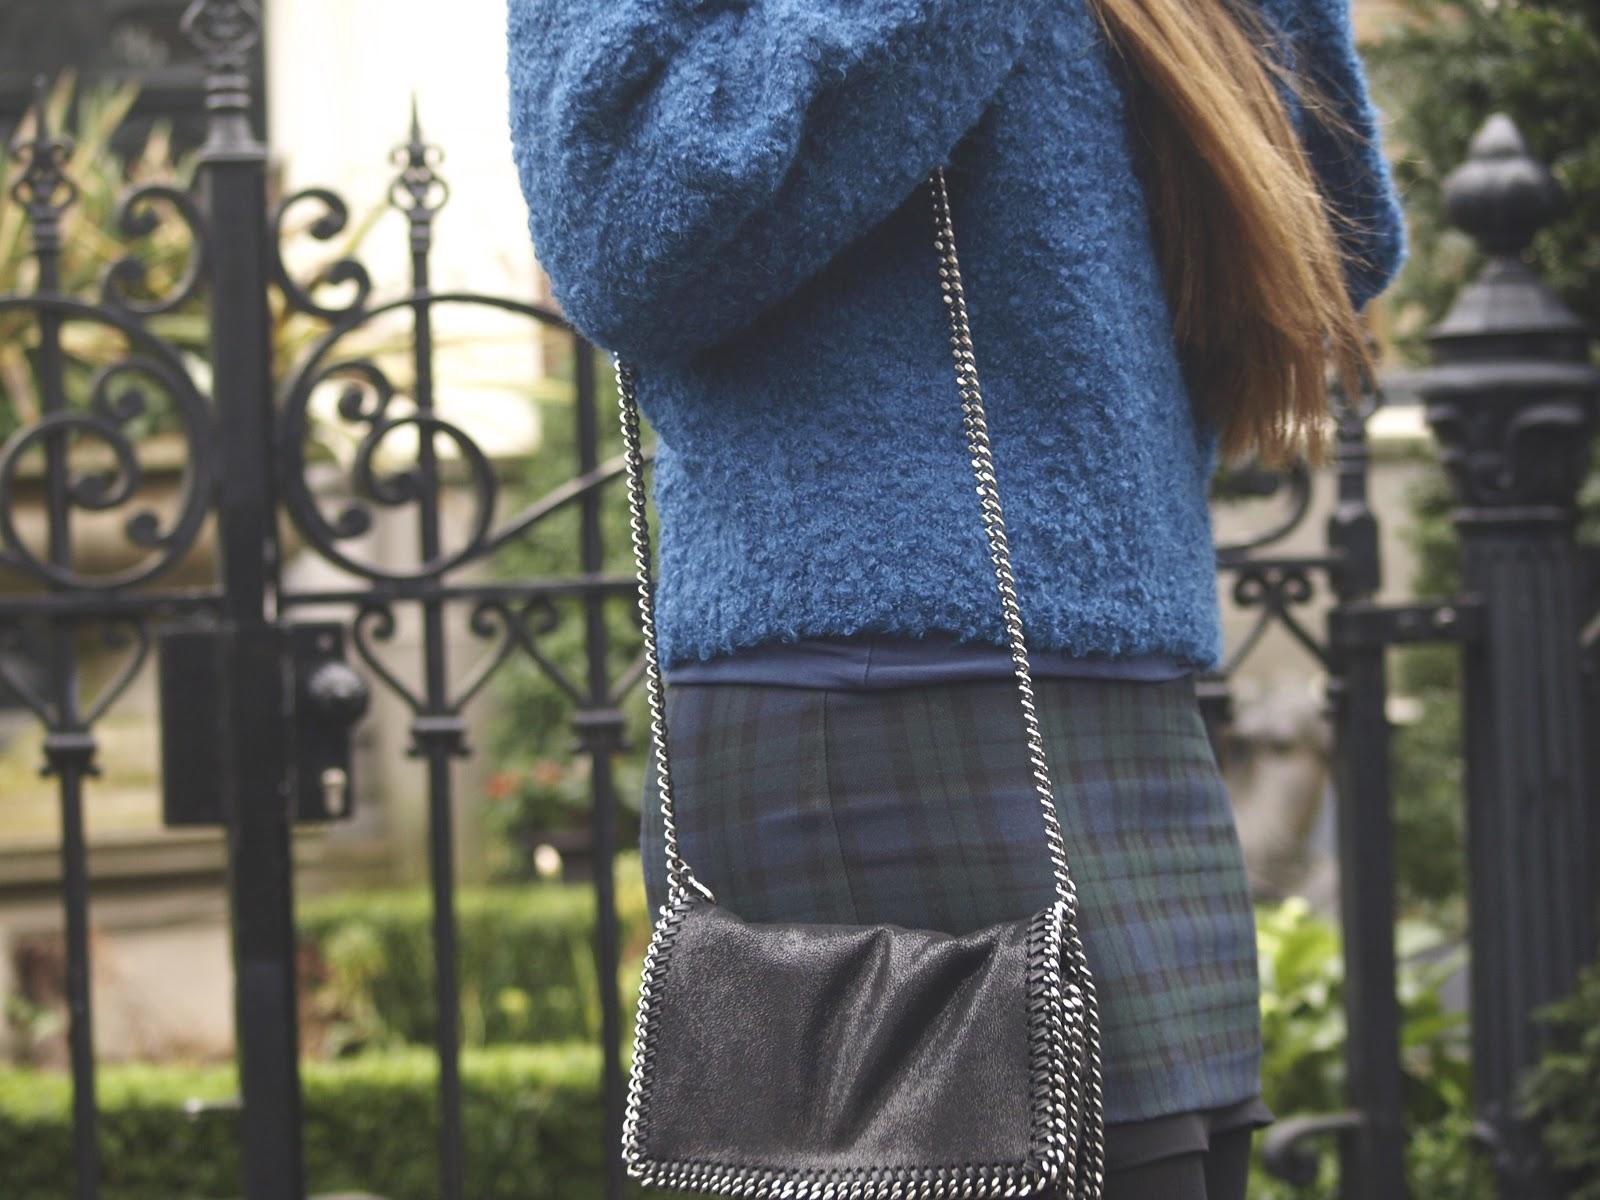 stella mccartney, zara, isabel marant, fashion, mode, blogger, new york, trip, planning, style